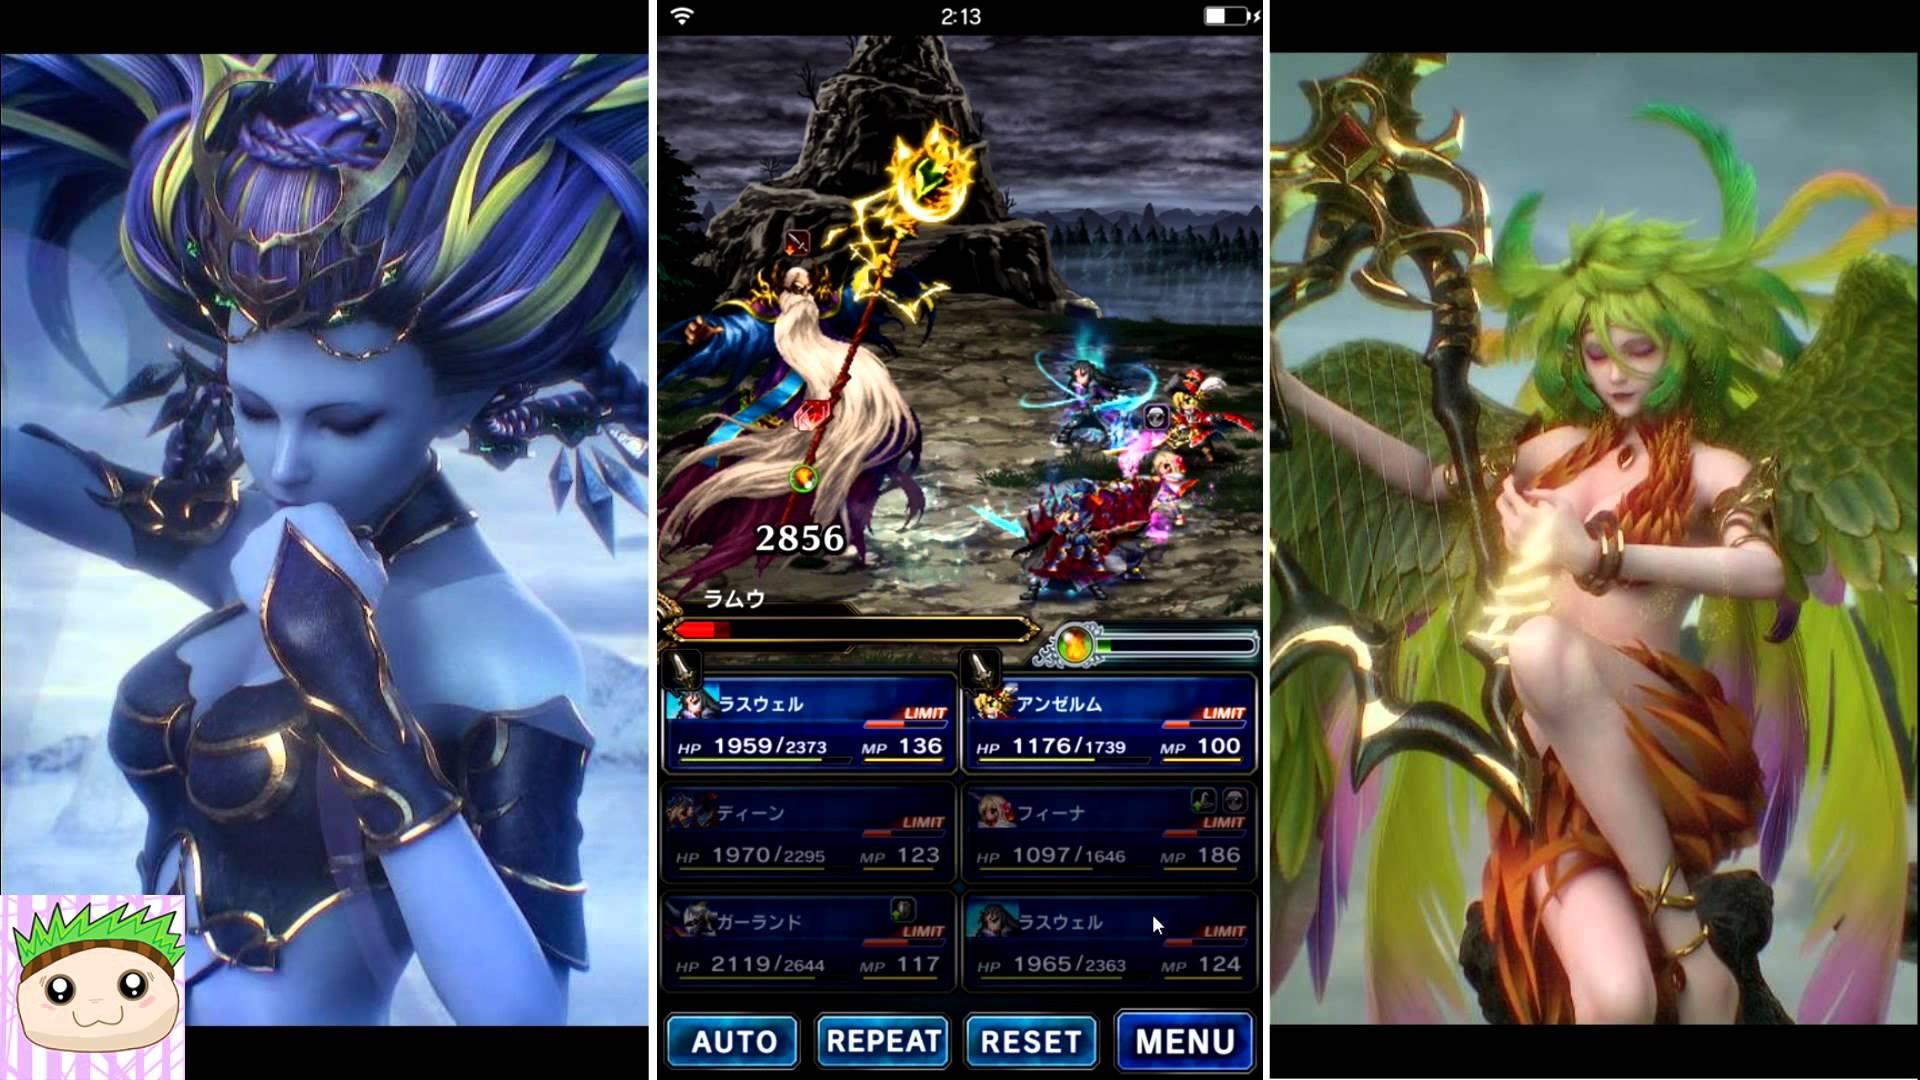 Final Fantasy: Brave Exvius The Psycho Clown Guide